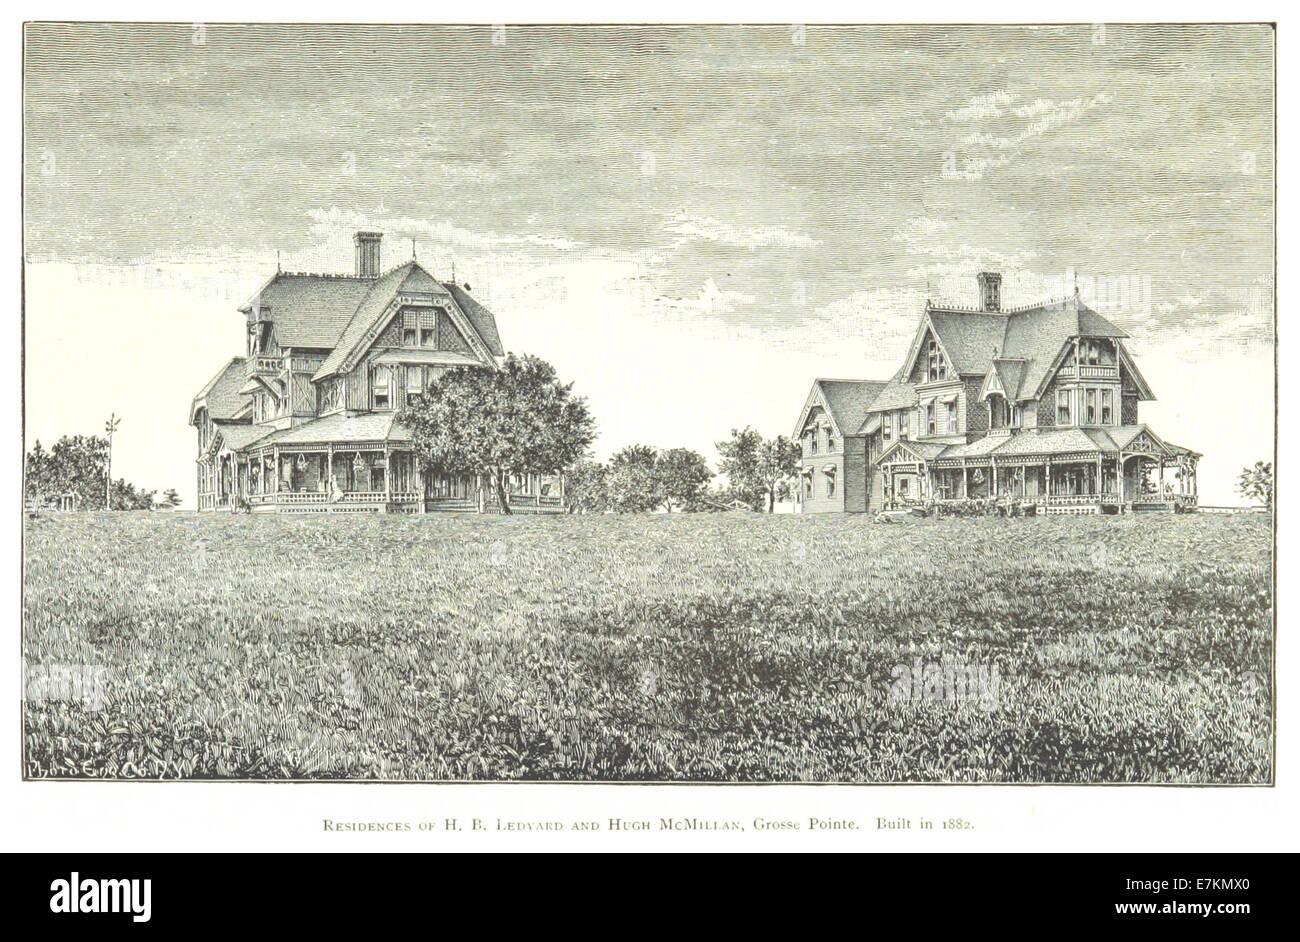 FARMER(1884) Detroit, p507 RESIDENCES OF H.B. LEDYARD AND HUGH McMILLAN, GROSSE POINTE, ON LAKE ST. CLAIR. BUILT - Stock Image